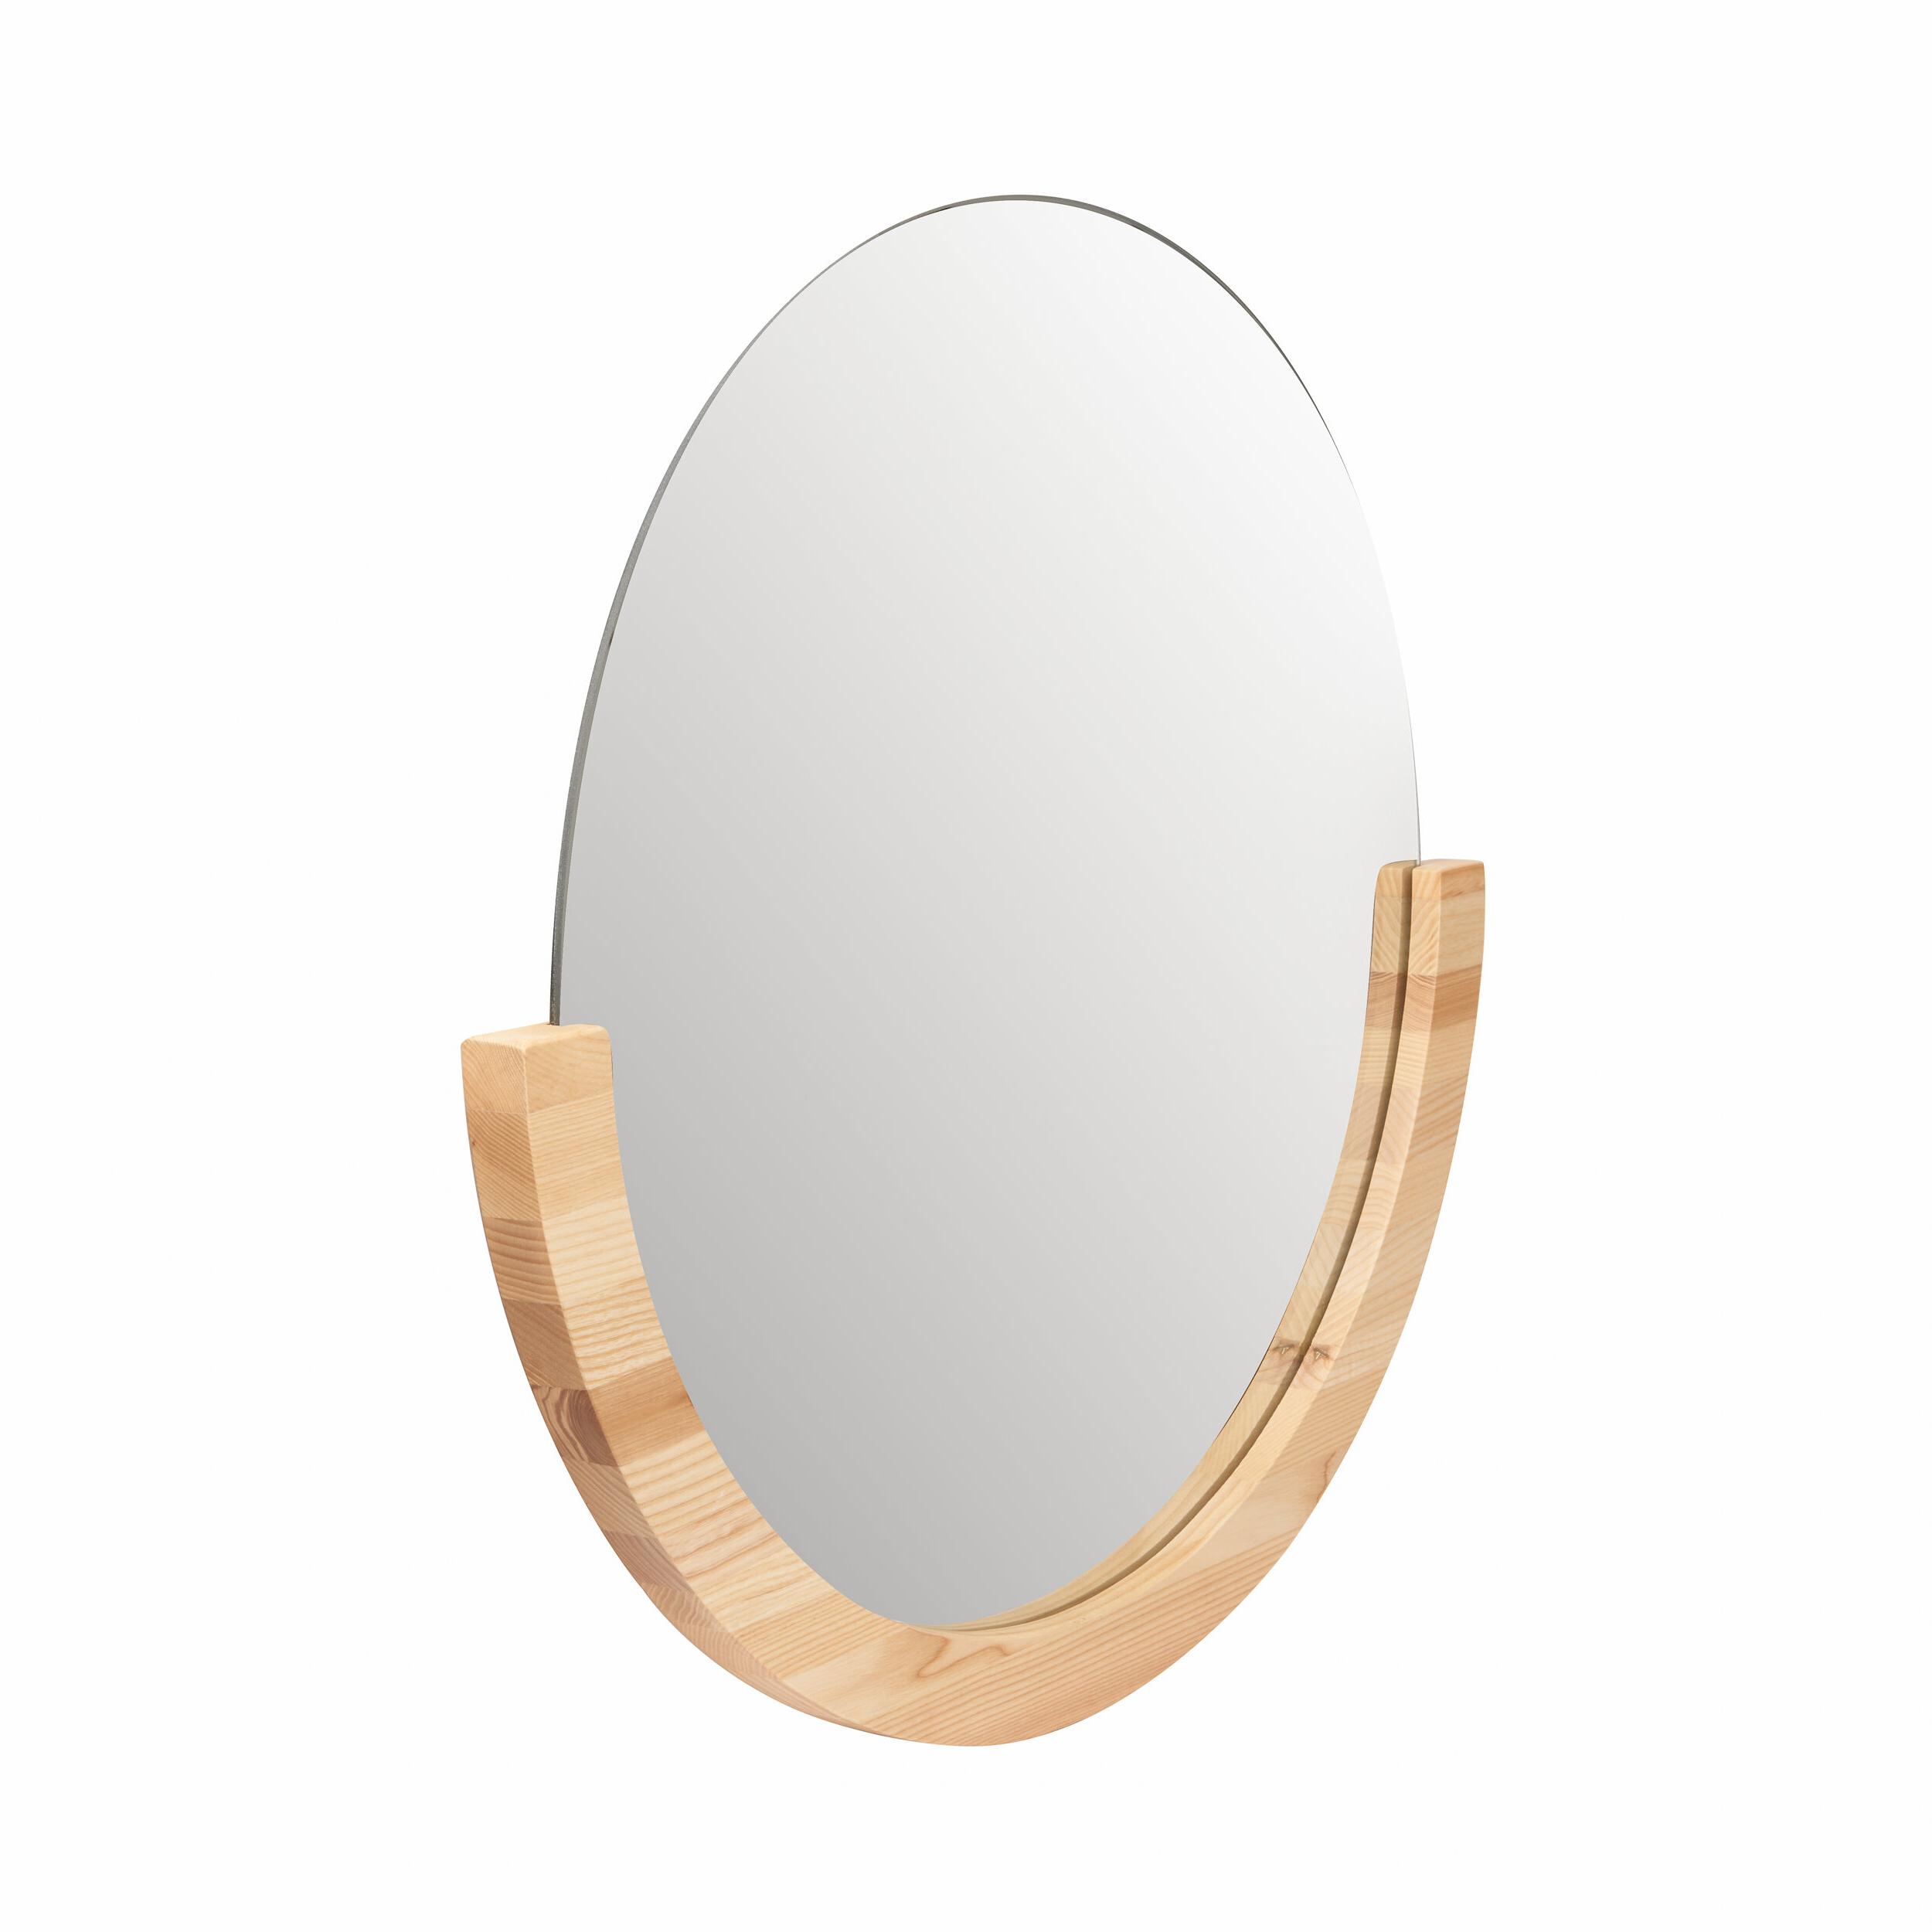 Most Popular Celeste Frameless Round Wall Mirrors Regarding Modern & Contemporary 28 Inch Round Mirror (View 15 of 20)